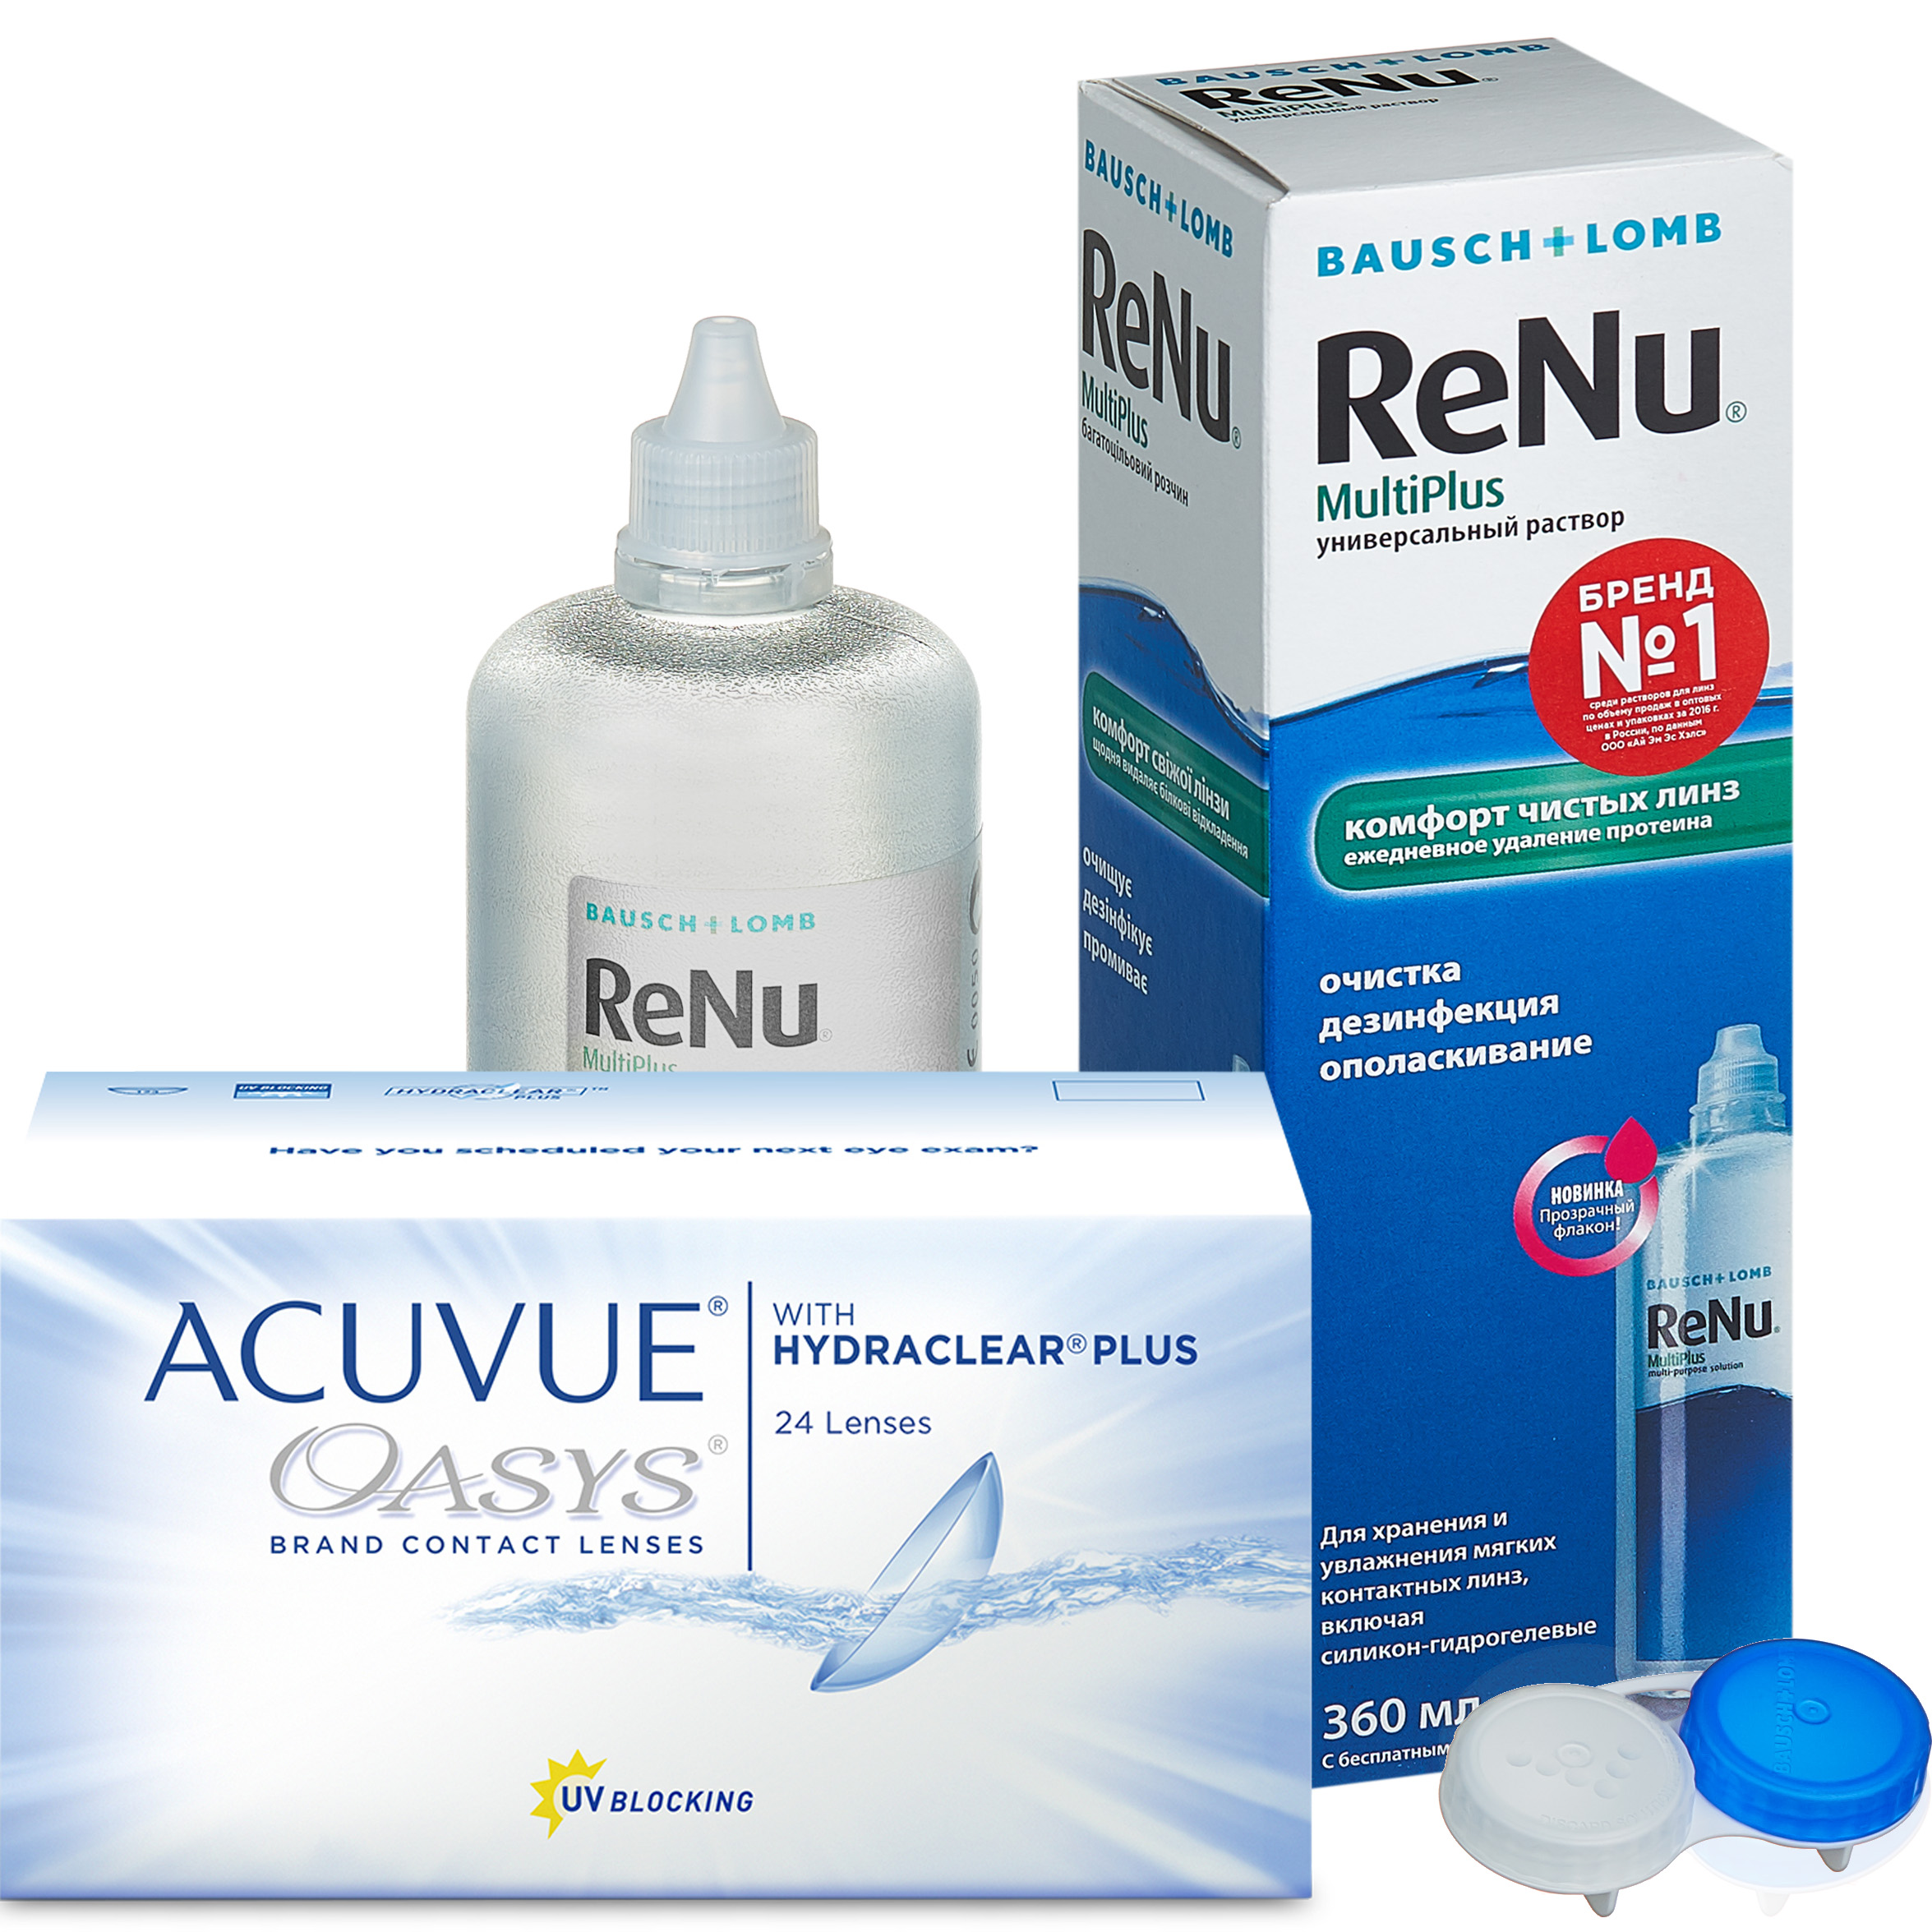 Купить Oasys with Hydraclear Plus 24 линзы + ReNu MultiPlus, Линзы Acuvue Oasys with Hydraclear Plus 24 линзы R 8.4 +1, 50 + ReNu Multi Plus 360 мл